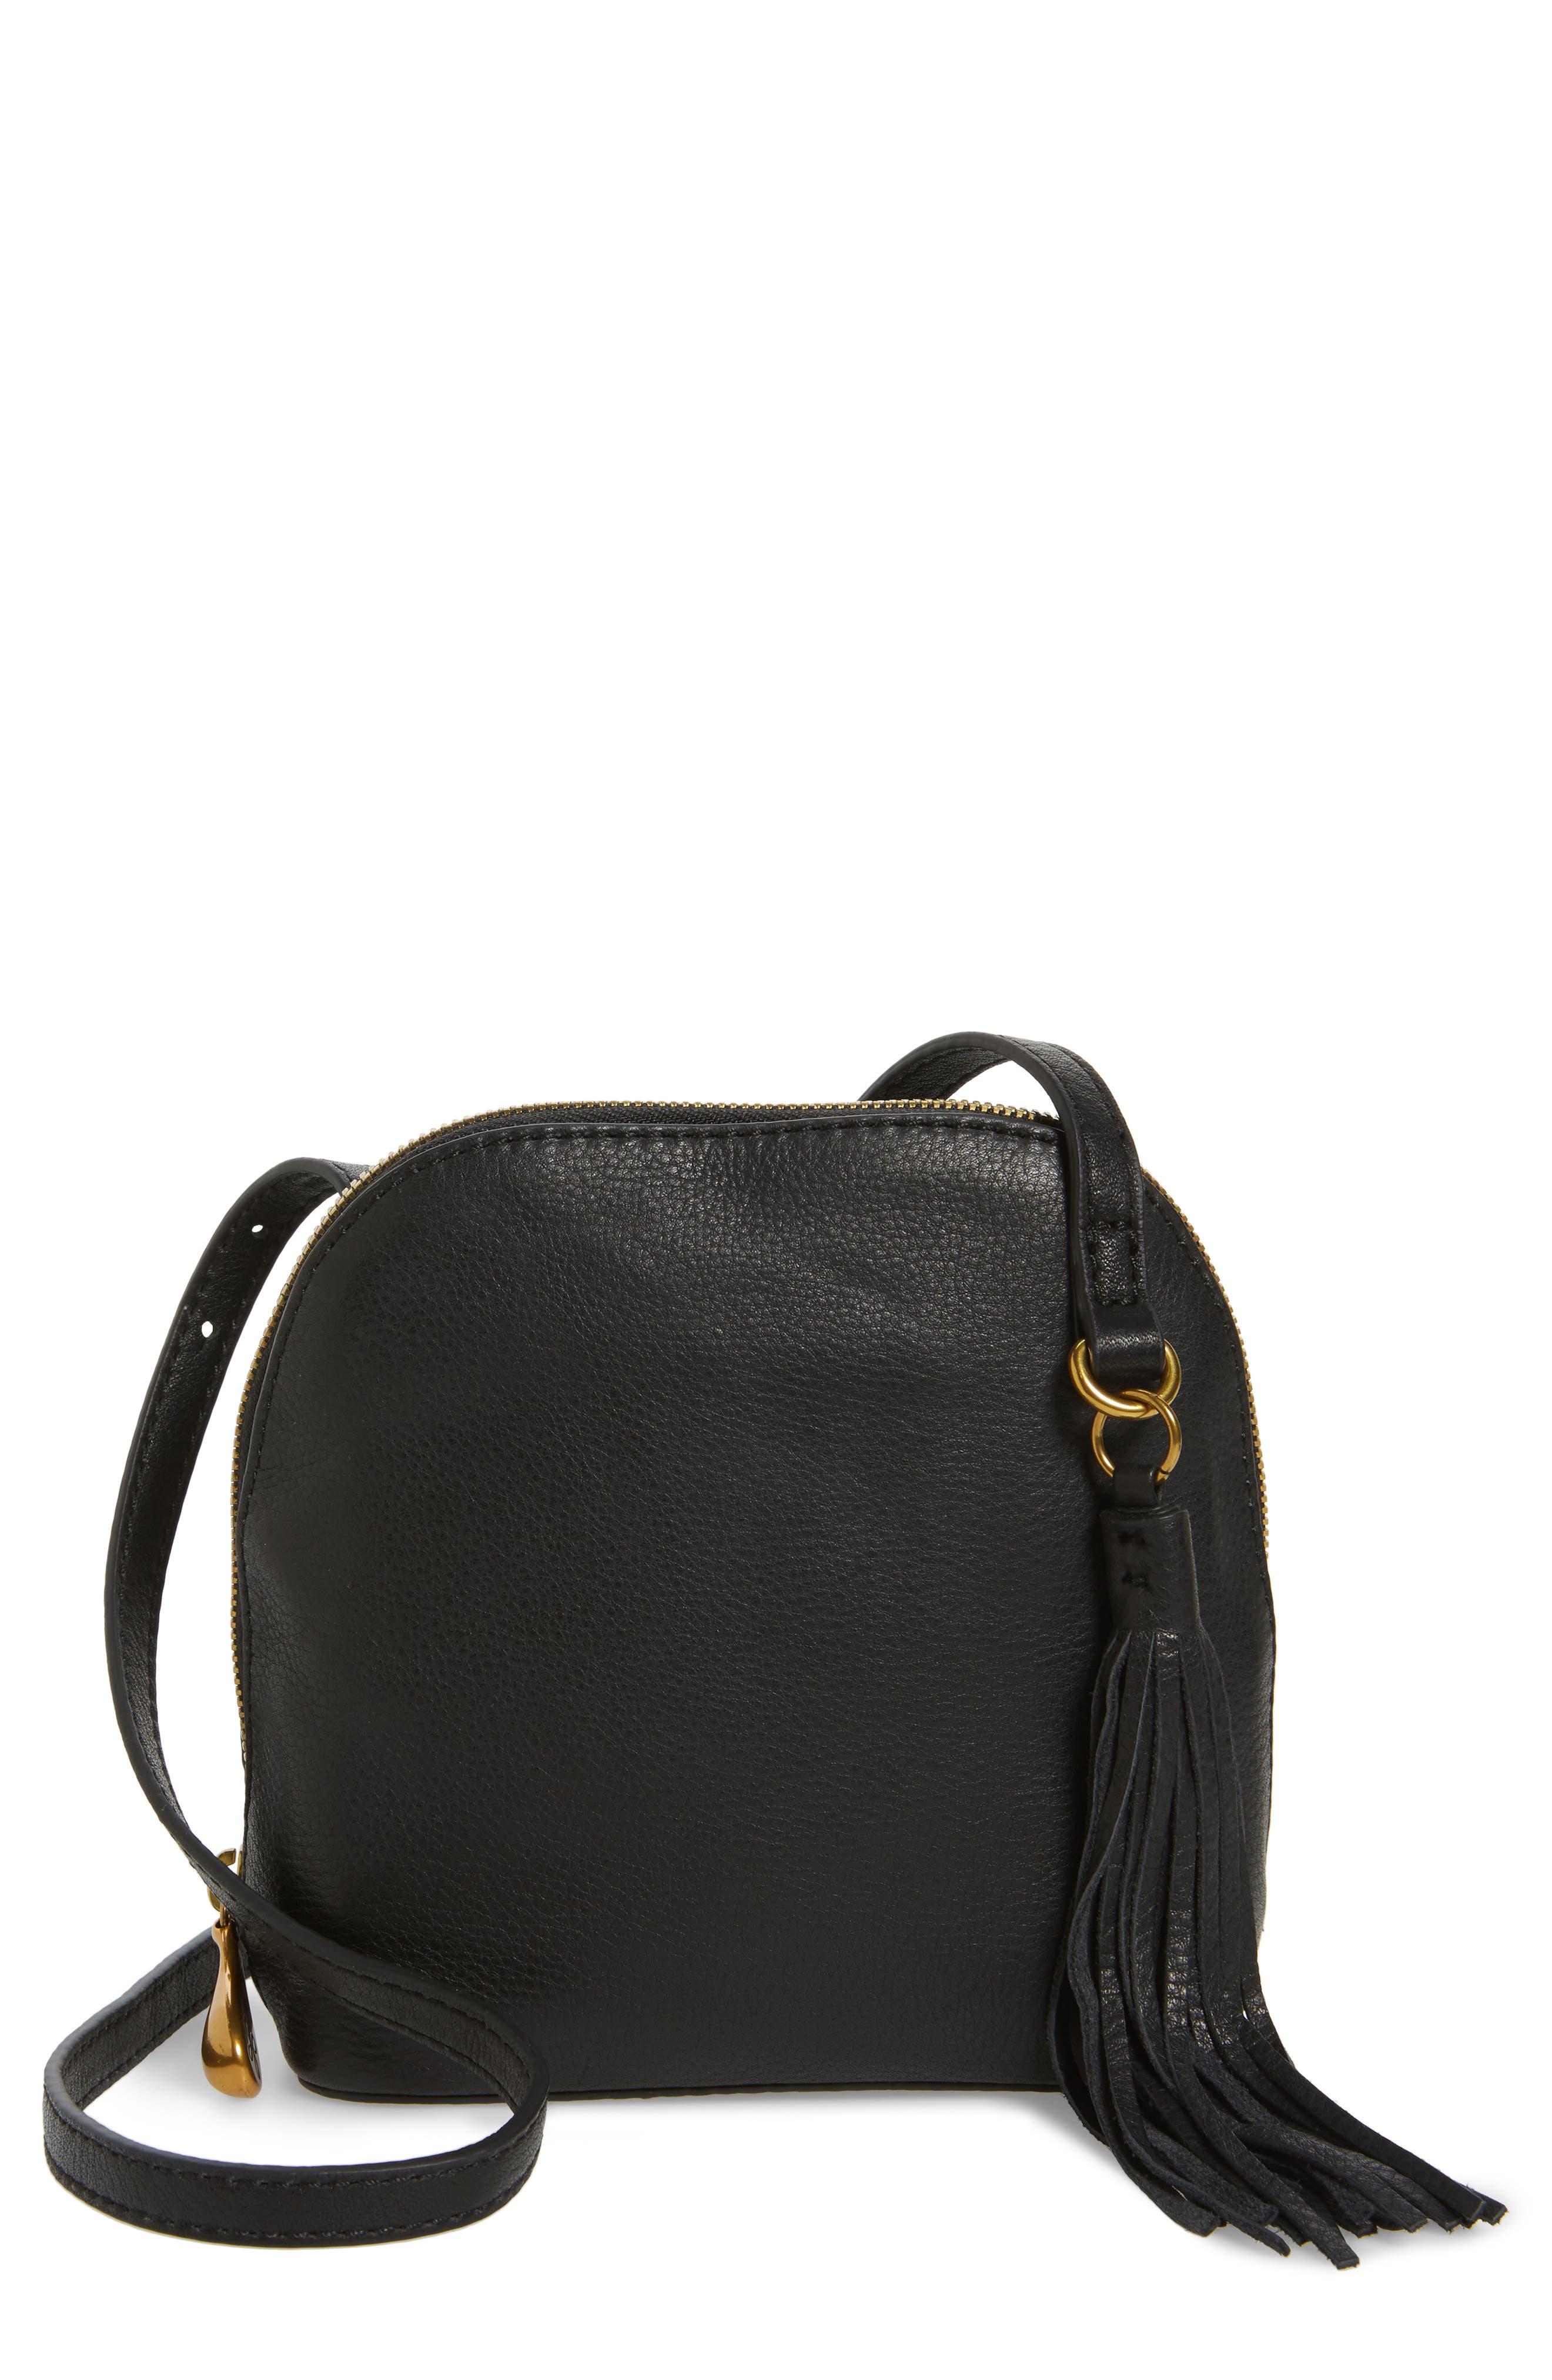 Nash Calfskin Leather Crossbody Bag,                             Main thumbnail 1, color,                             Black